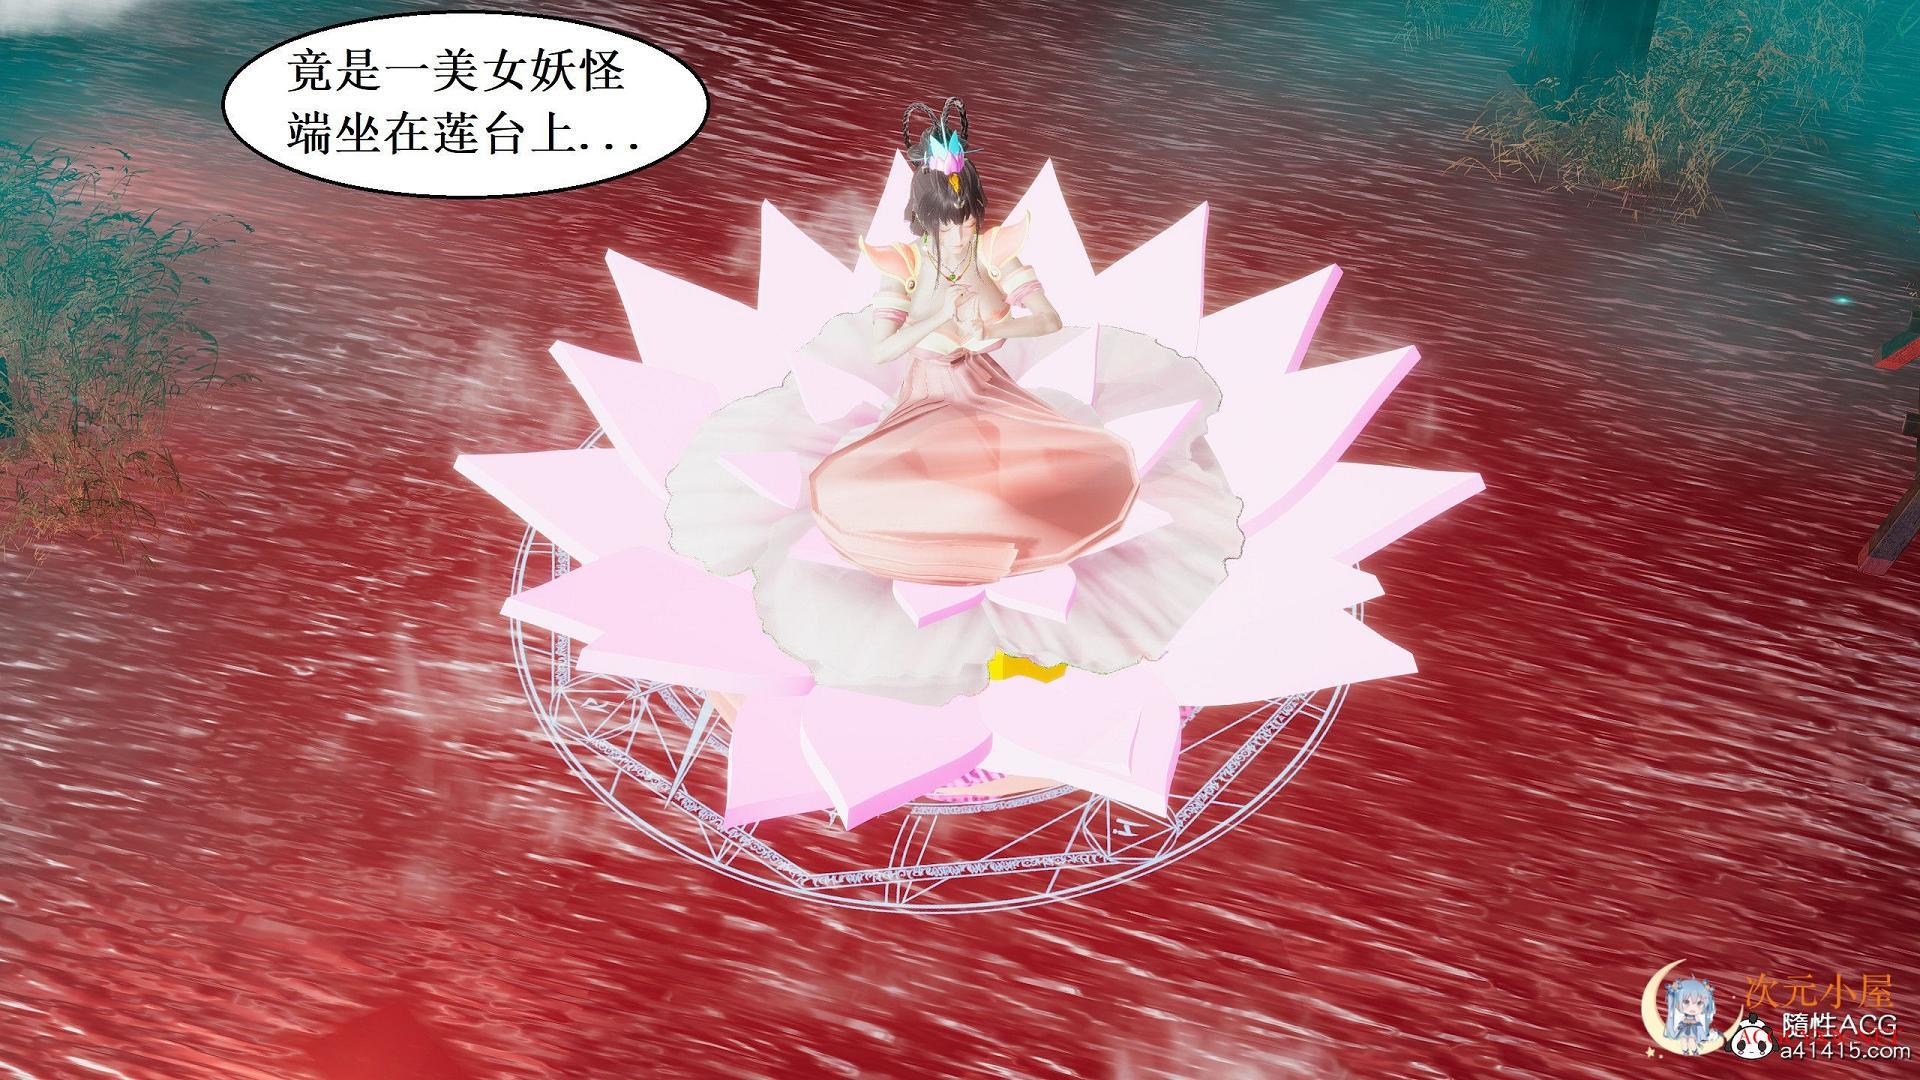 [3D全彩/无修]魔法少女葫芦妹 01-09★玄幻大作 [堕落RBQ/姐妹花][652M]  814 次元小屋